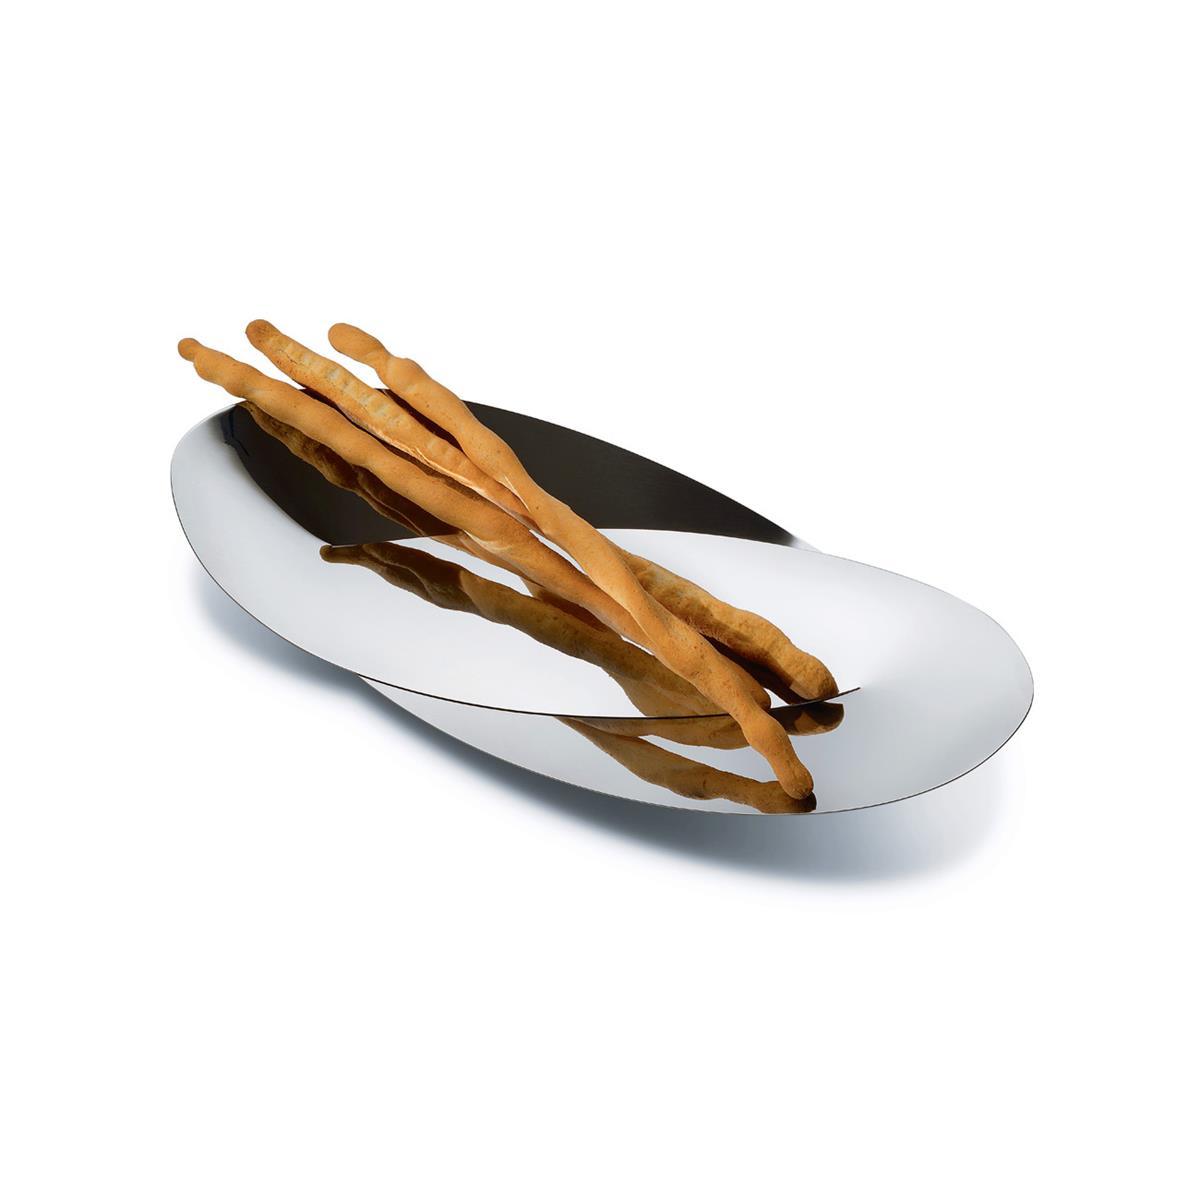 Alessi-Octave Cestino per pane e grissini in acciaio inox 18/10